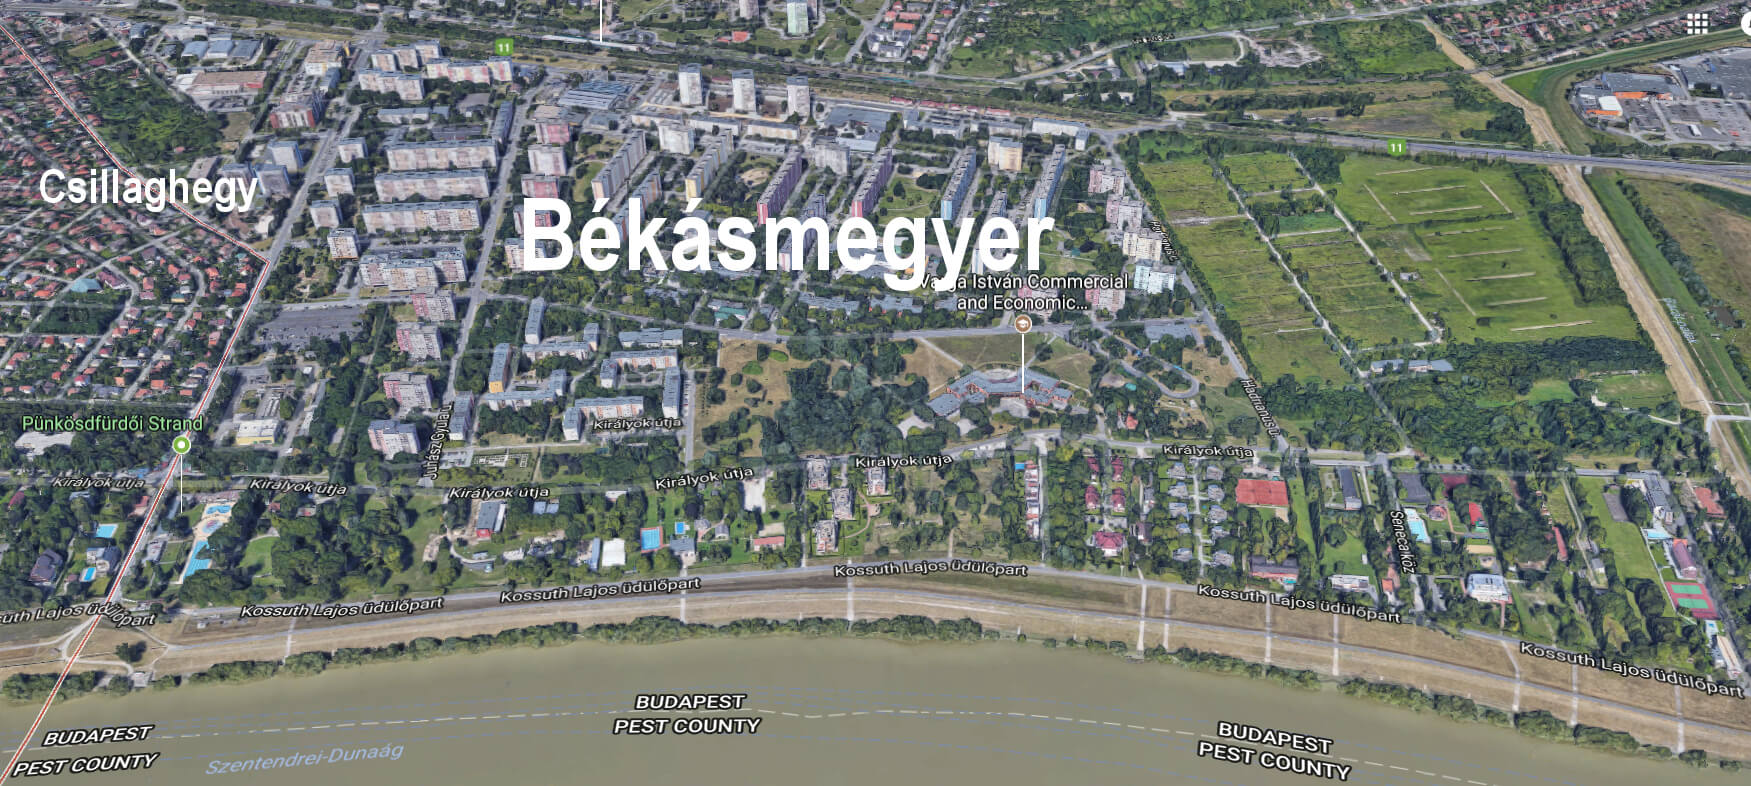 Terkep Felulrol Duna Felol Bekasmegyer Alacsonyjutalek Hu